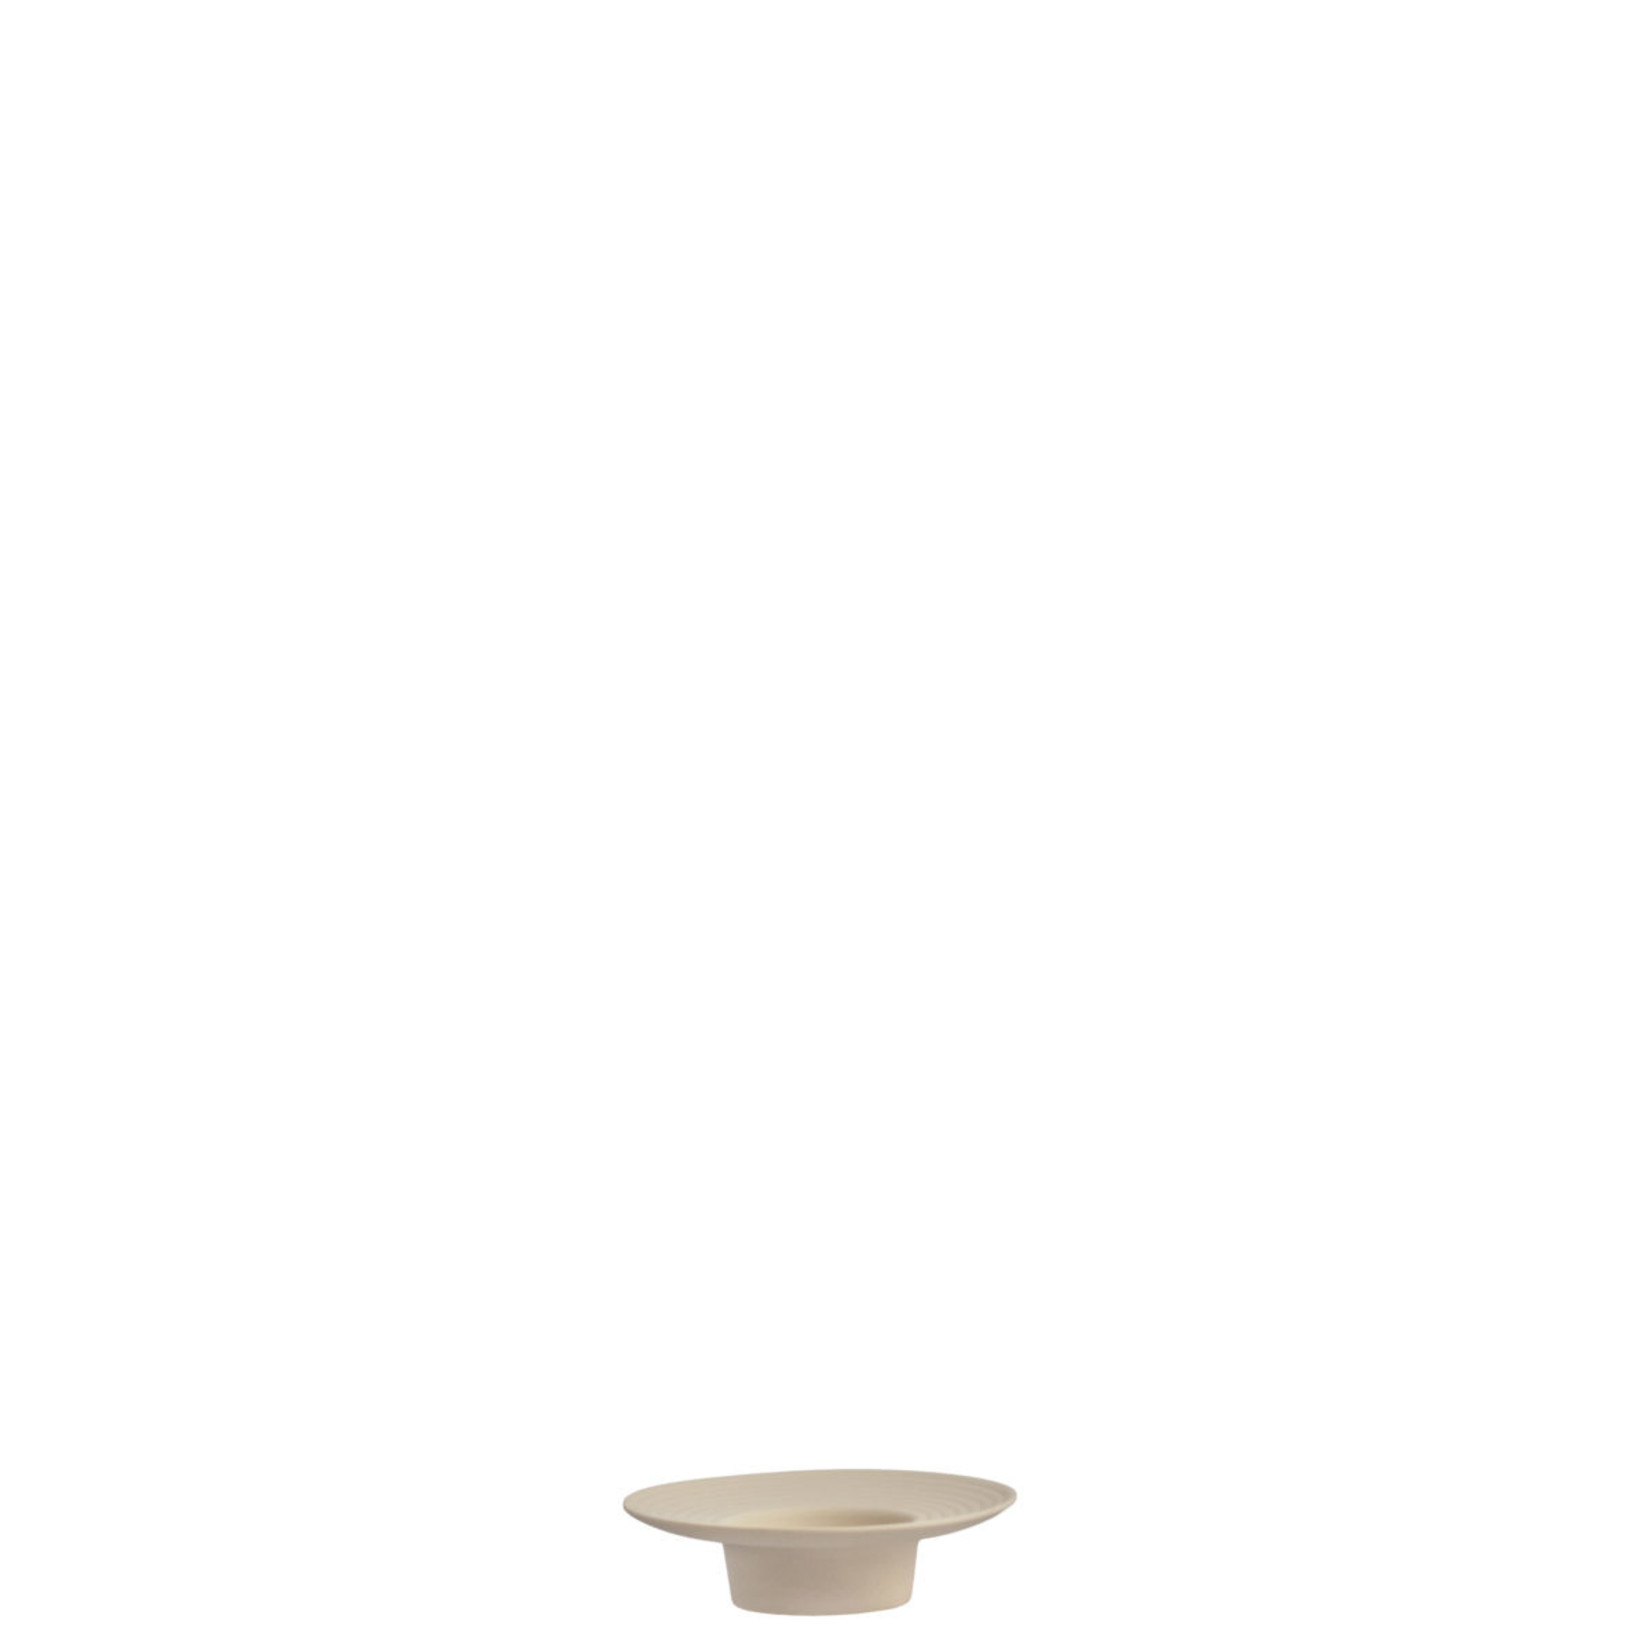 Storefactory  Teelichthalter Tveta beige